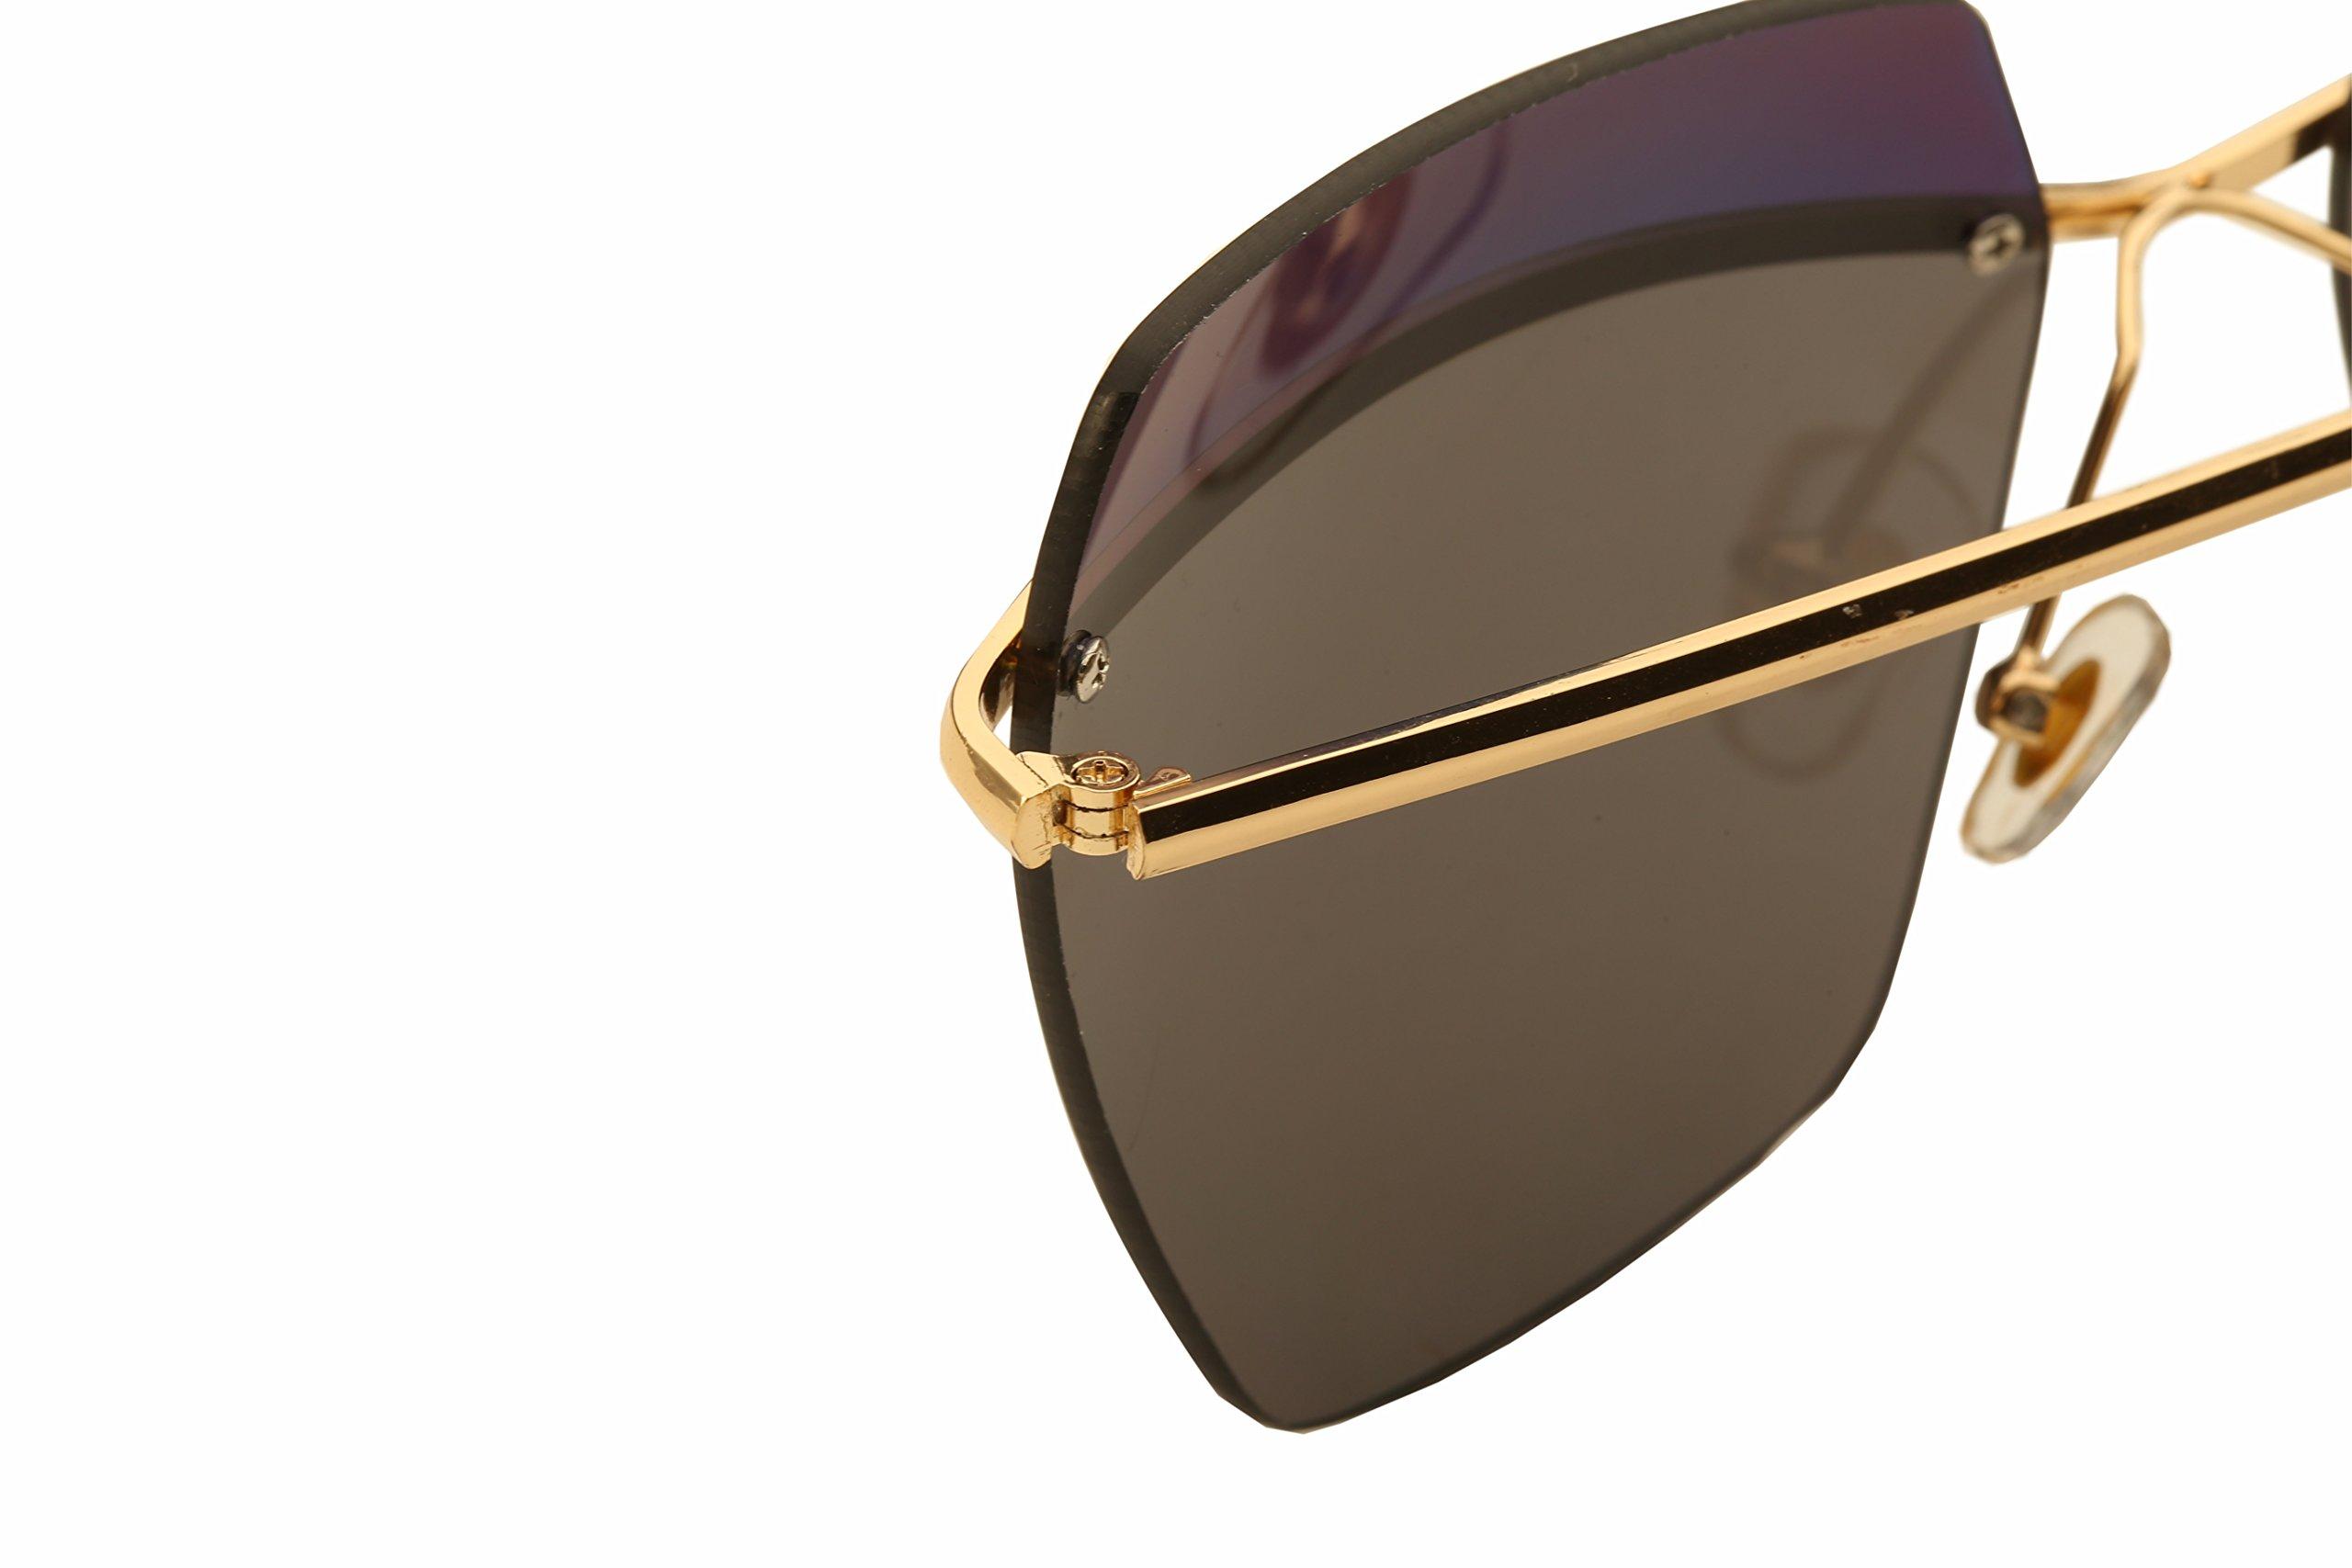 Diamond Candy Women\'s Fashion Sunglasses UV Protection Sexy Eyewear UV400 Goggles 3Gold